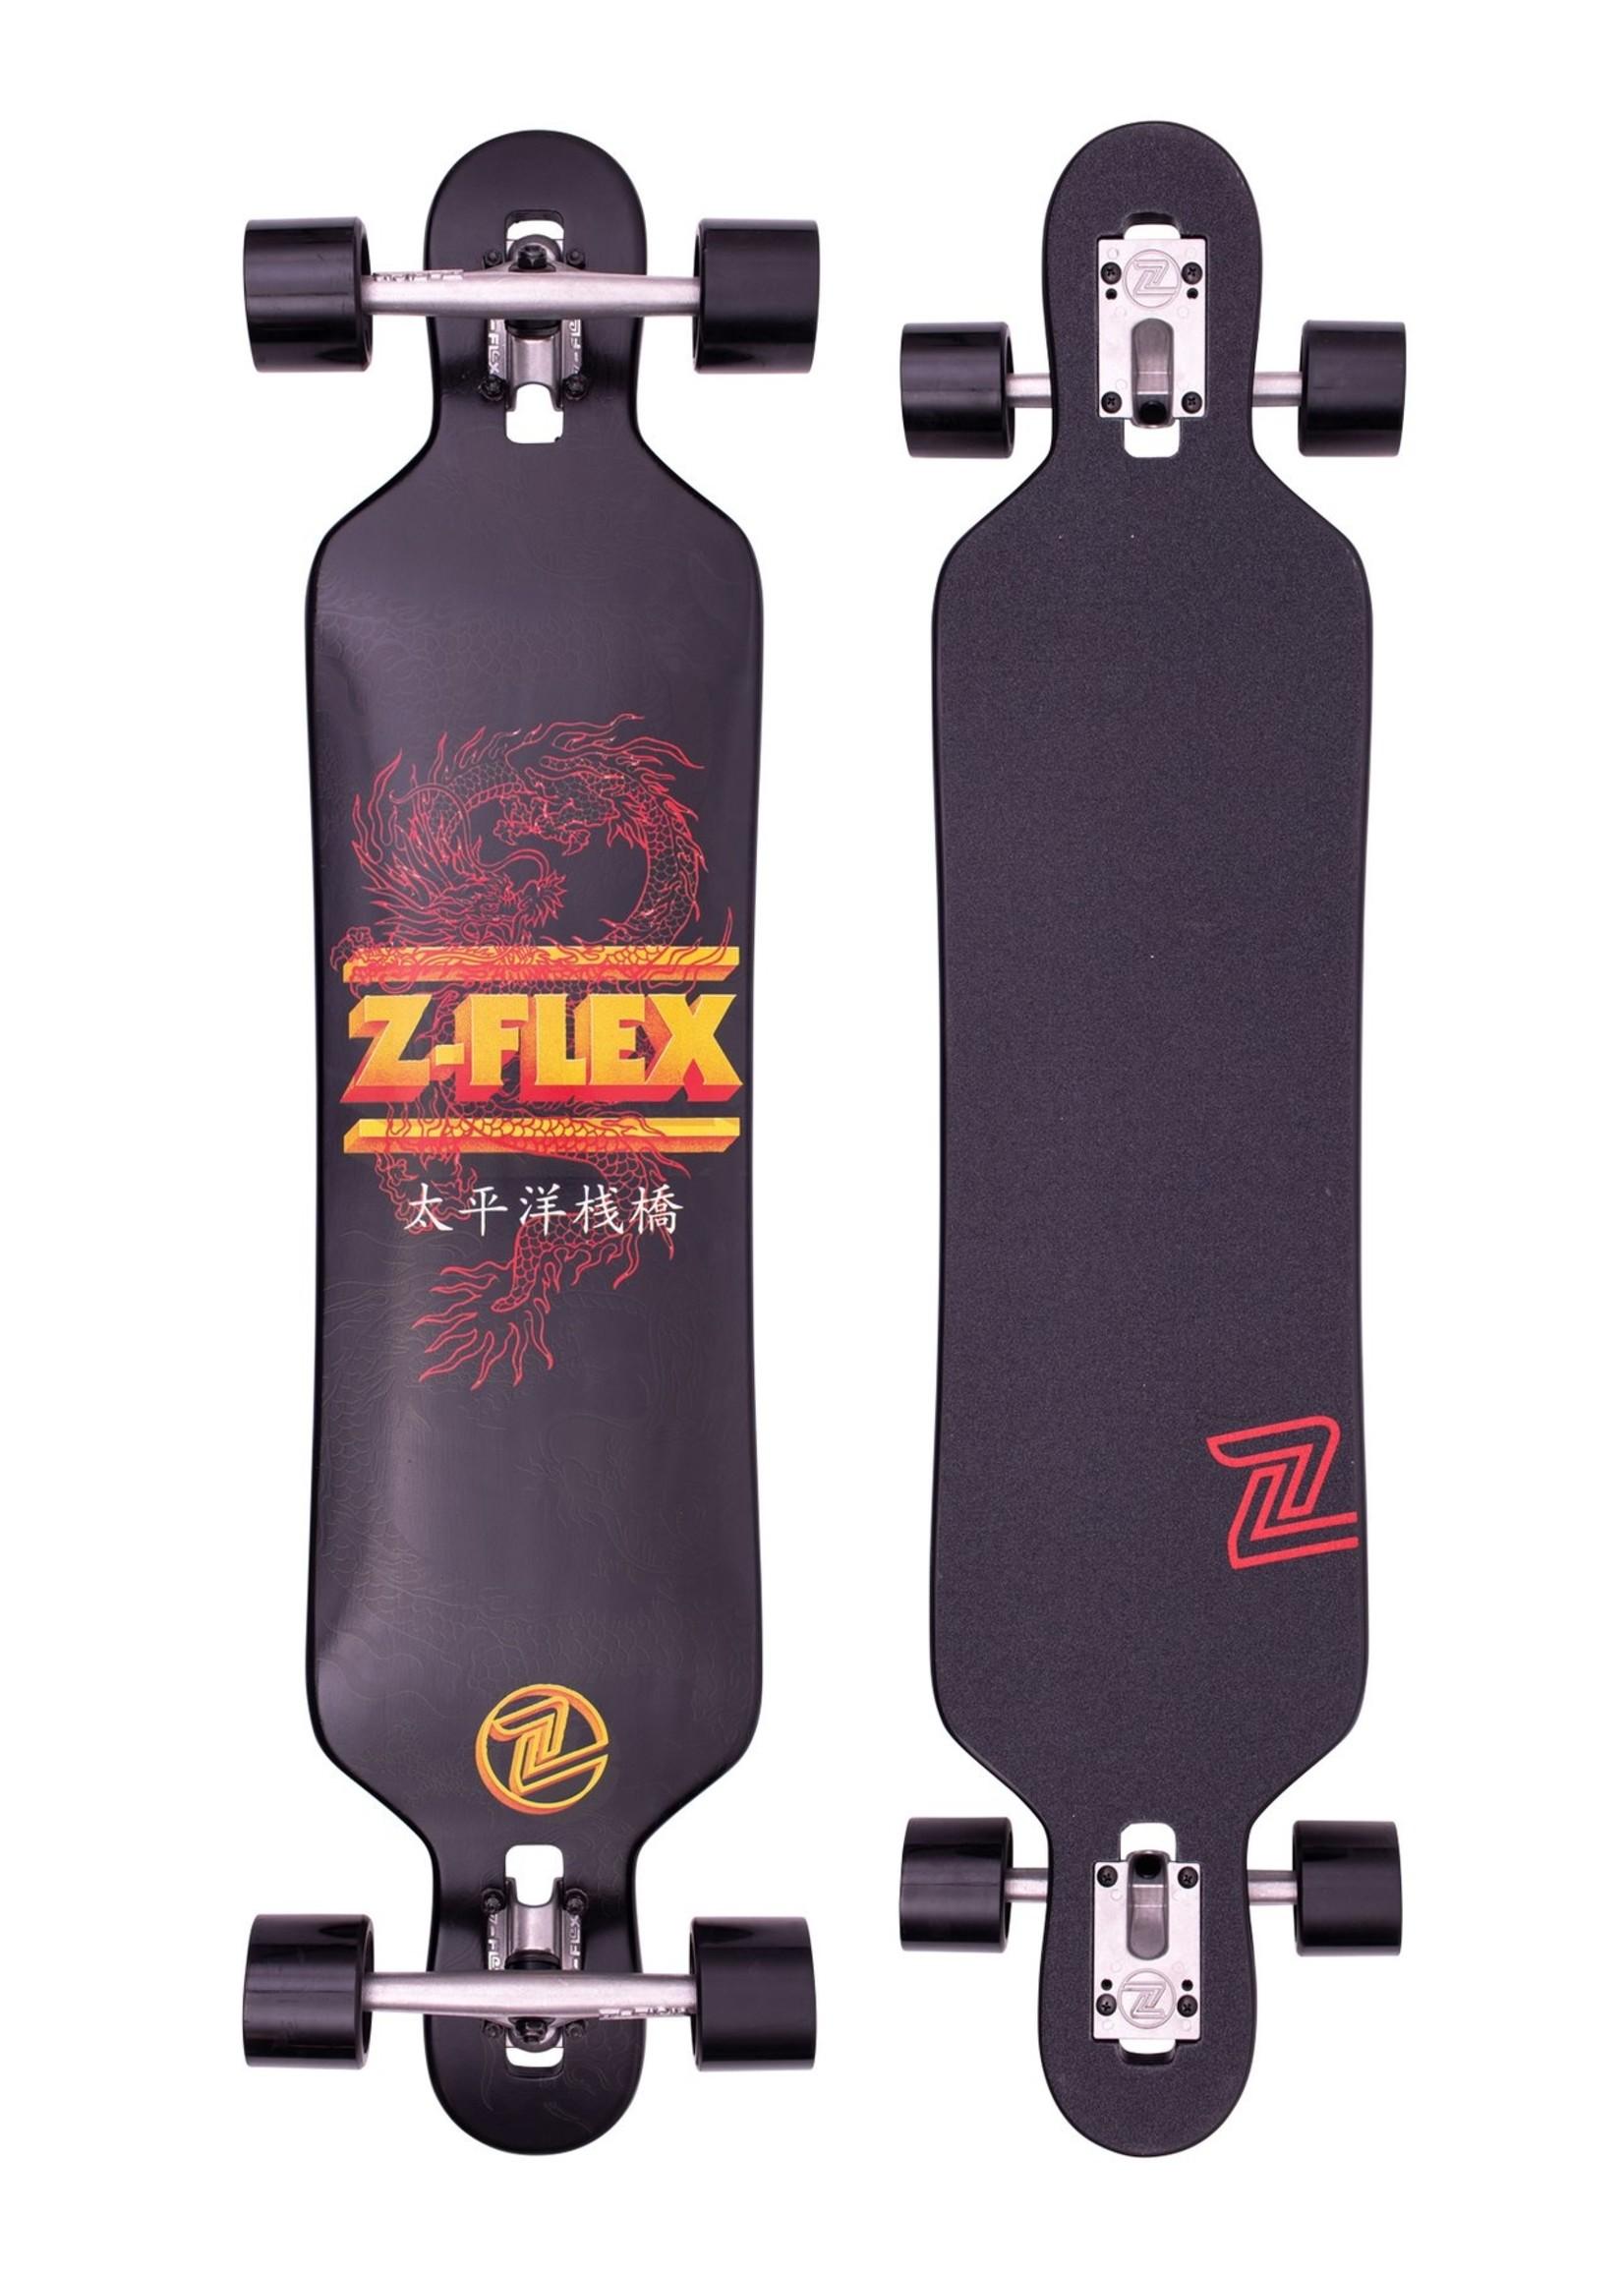 ZFlex ZFLEX DROP THRU DRAGON 41 ZFXL0087